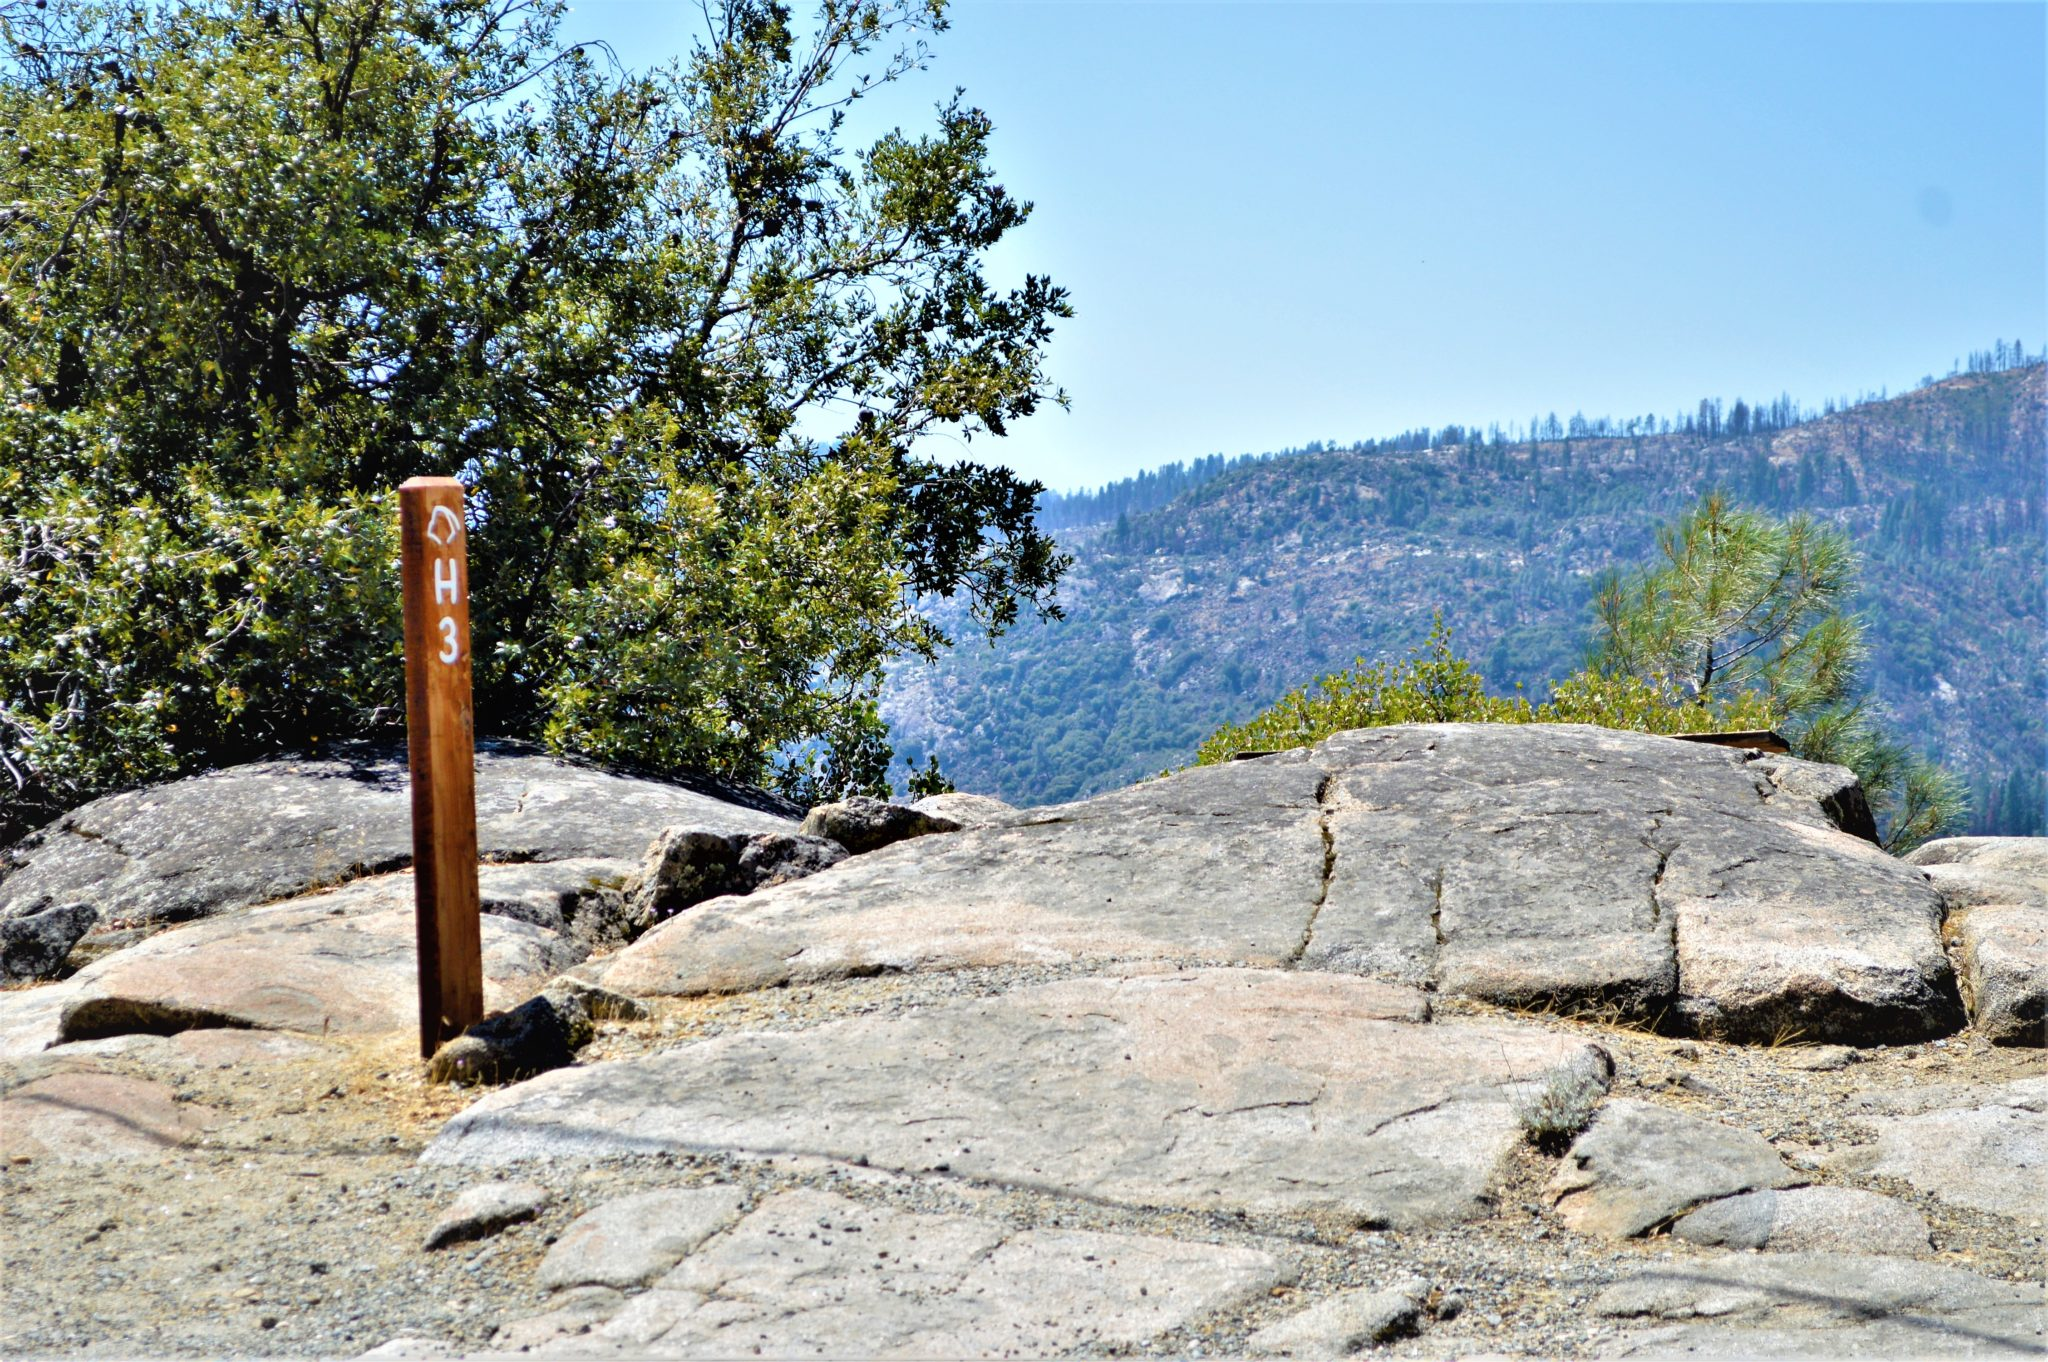 H3 viewpoint, Hetch Hetchy, California